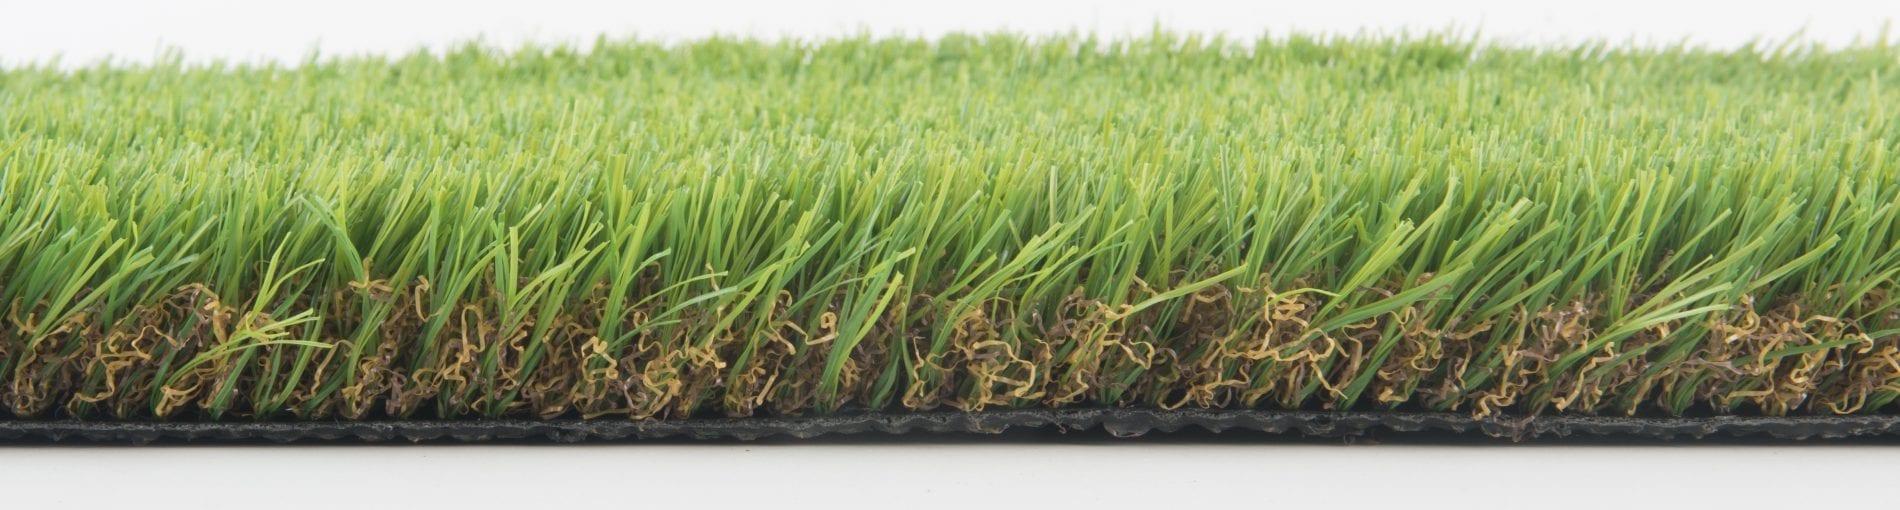 EDEN Artificial Lawn